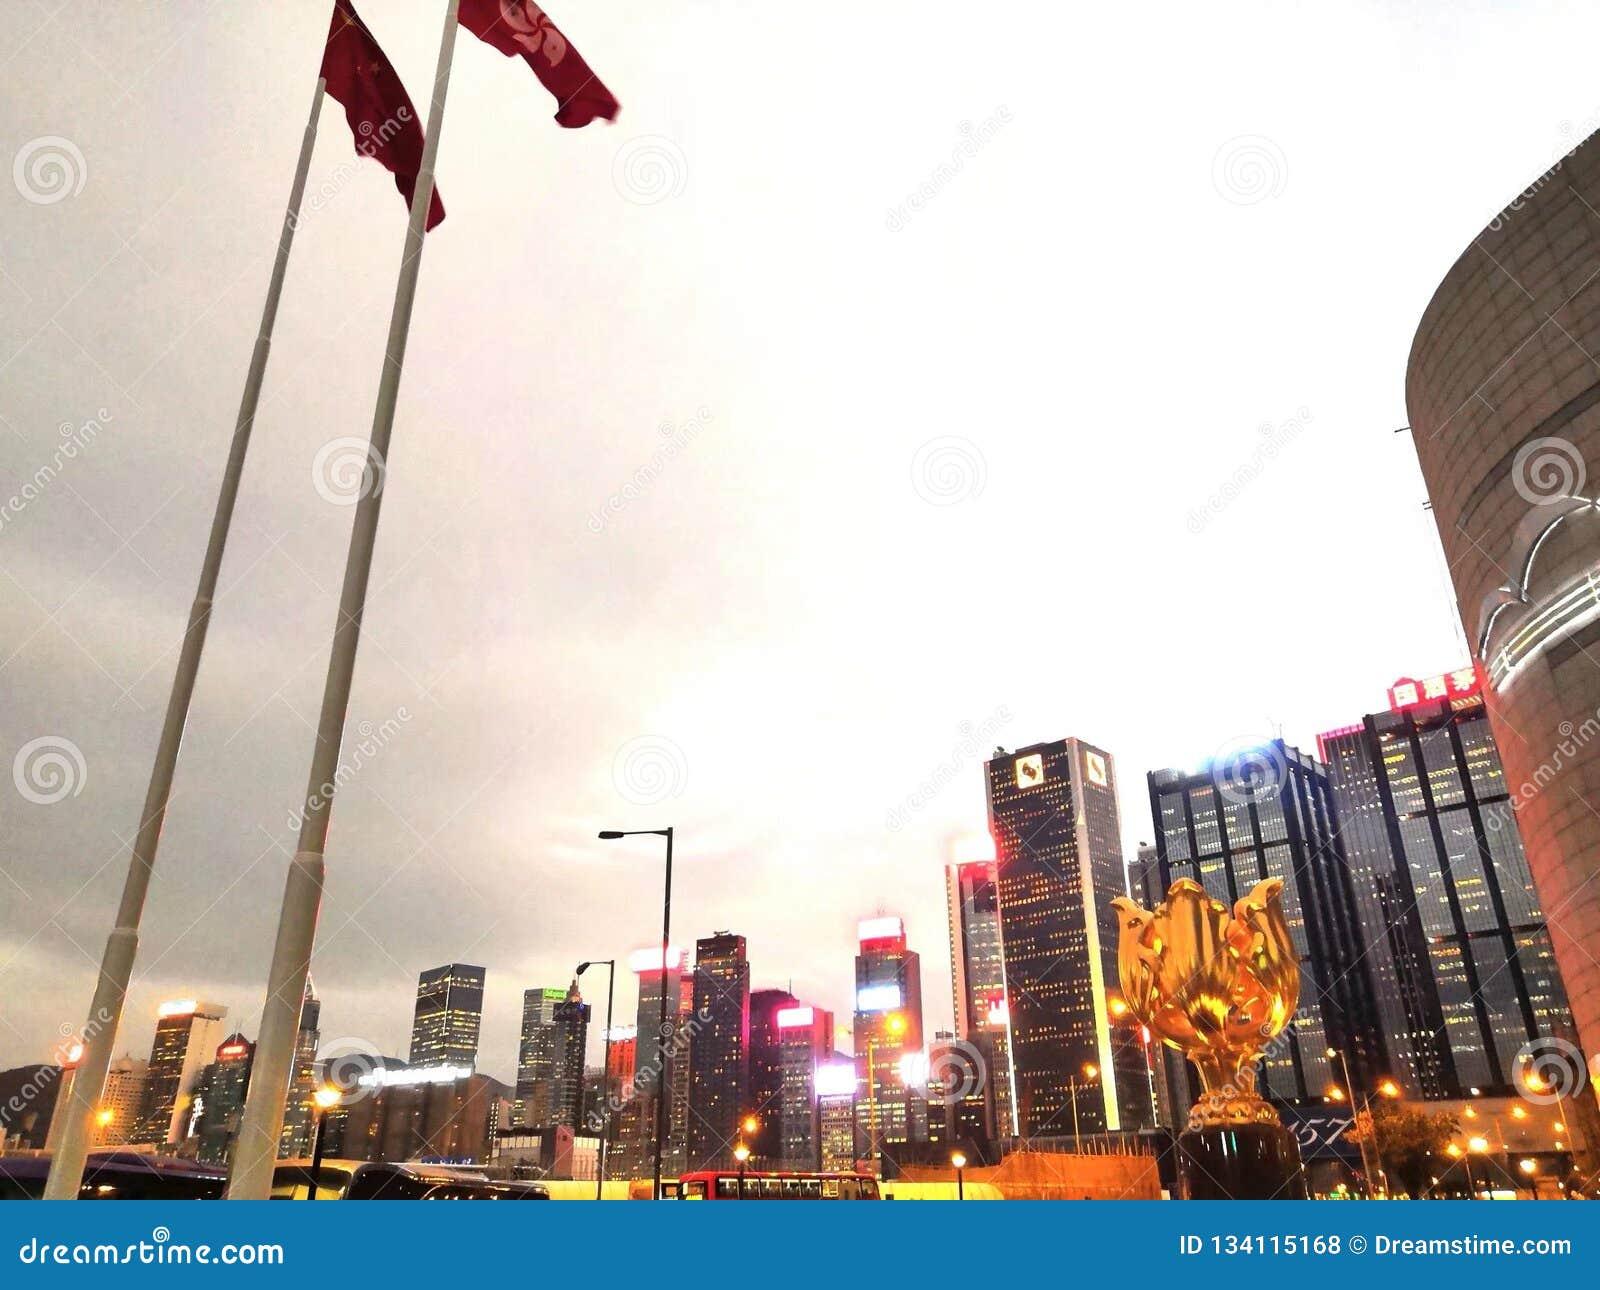 квадрат Bauhinia 场 ¿ ¹ å †  è «ç» ‡ «é 香港 золотой, Гонконг